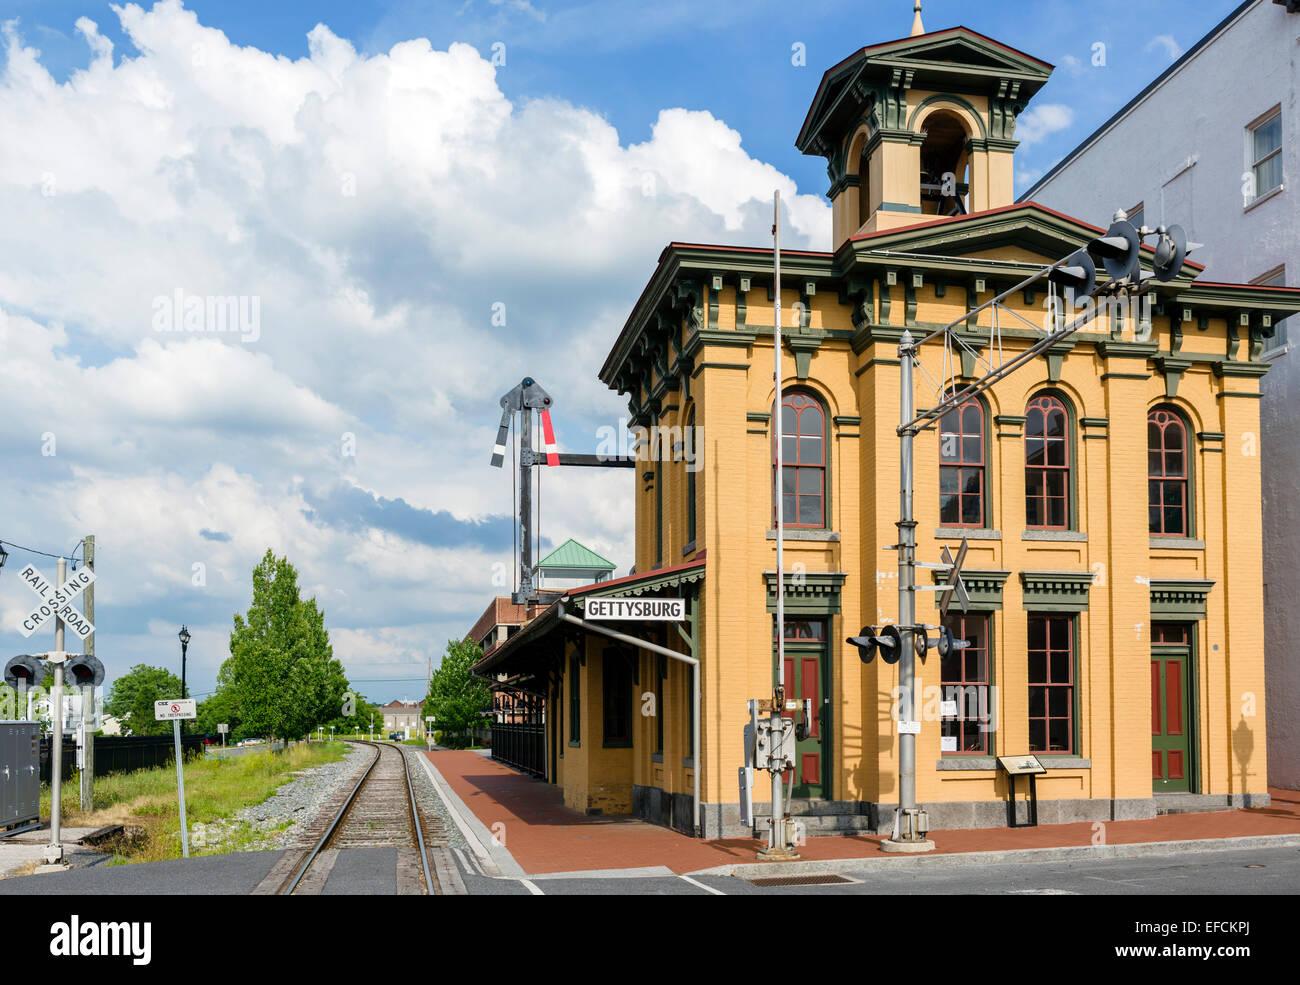 Historic Gettysburg Train Station in downtown Gettysburg, Adams County, Pennsylvania, USA - Stock Image